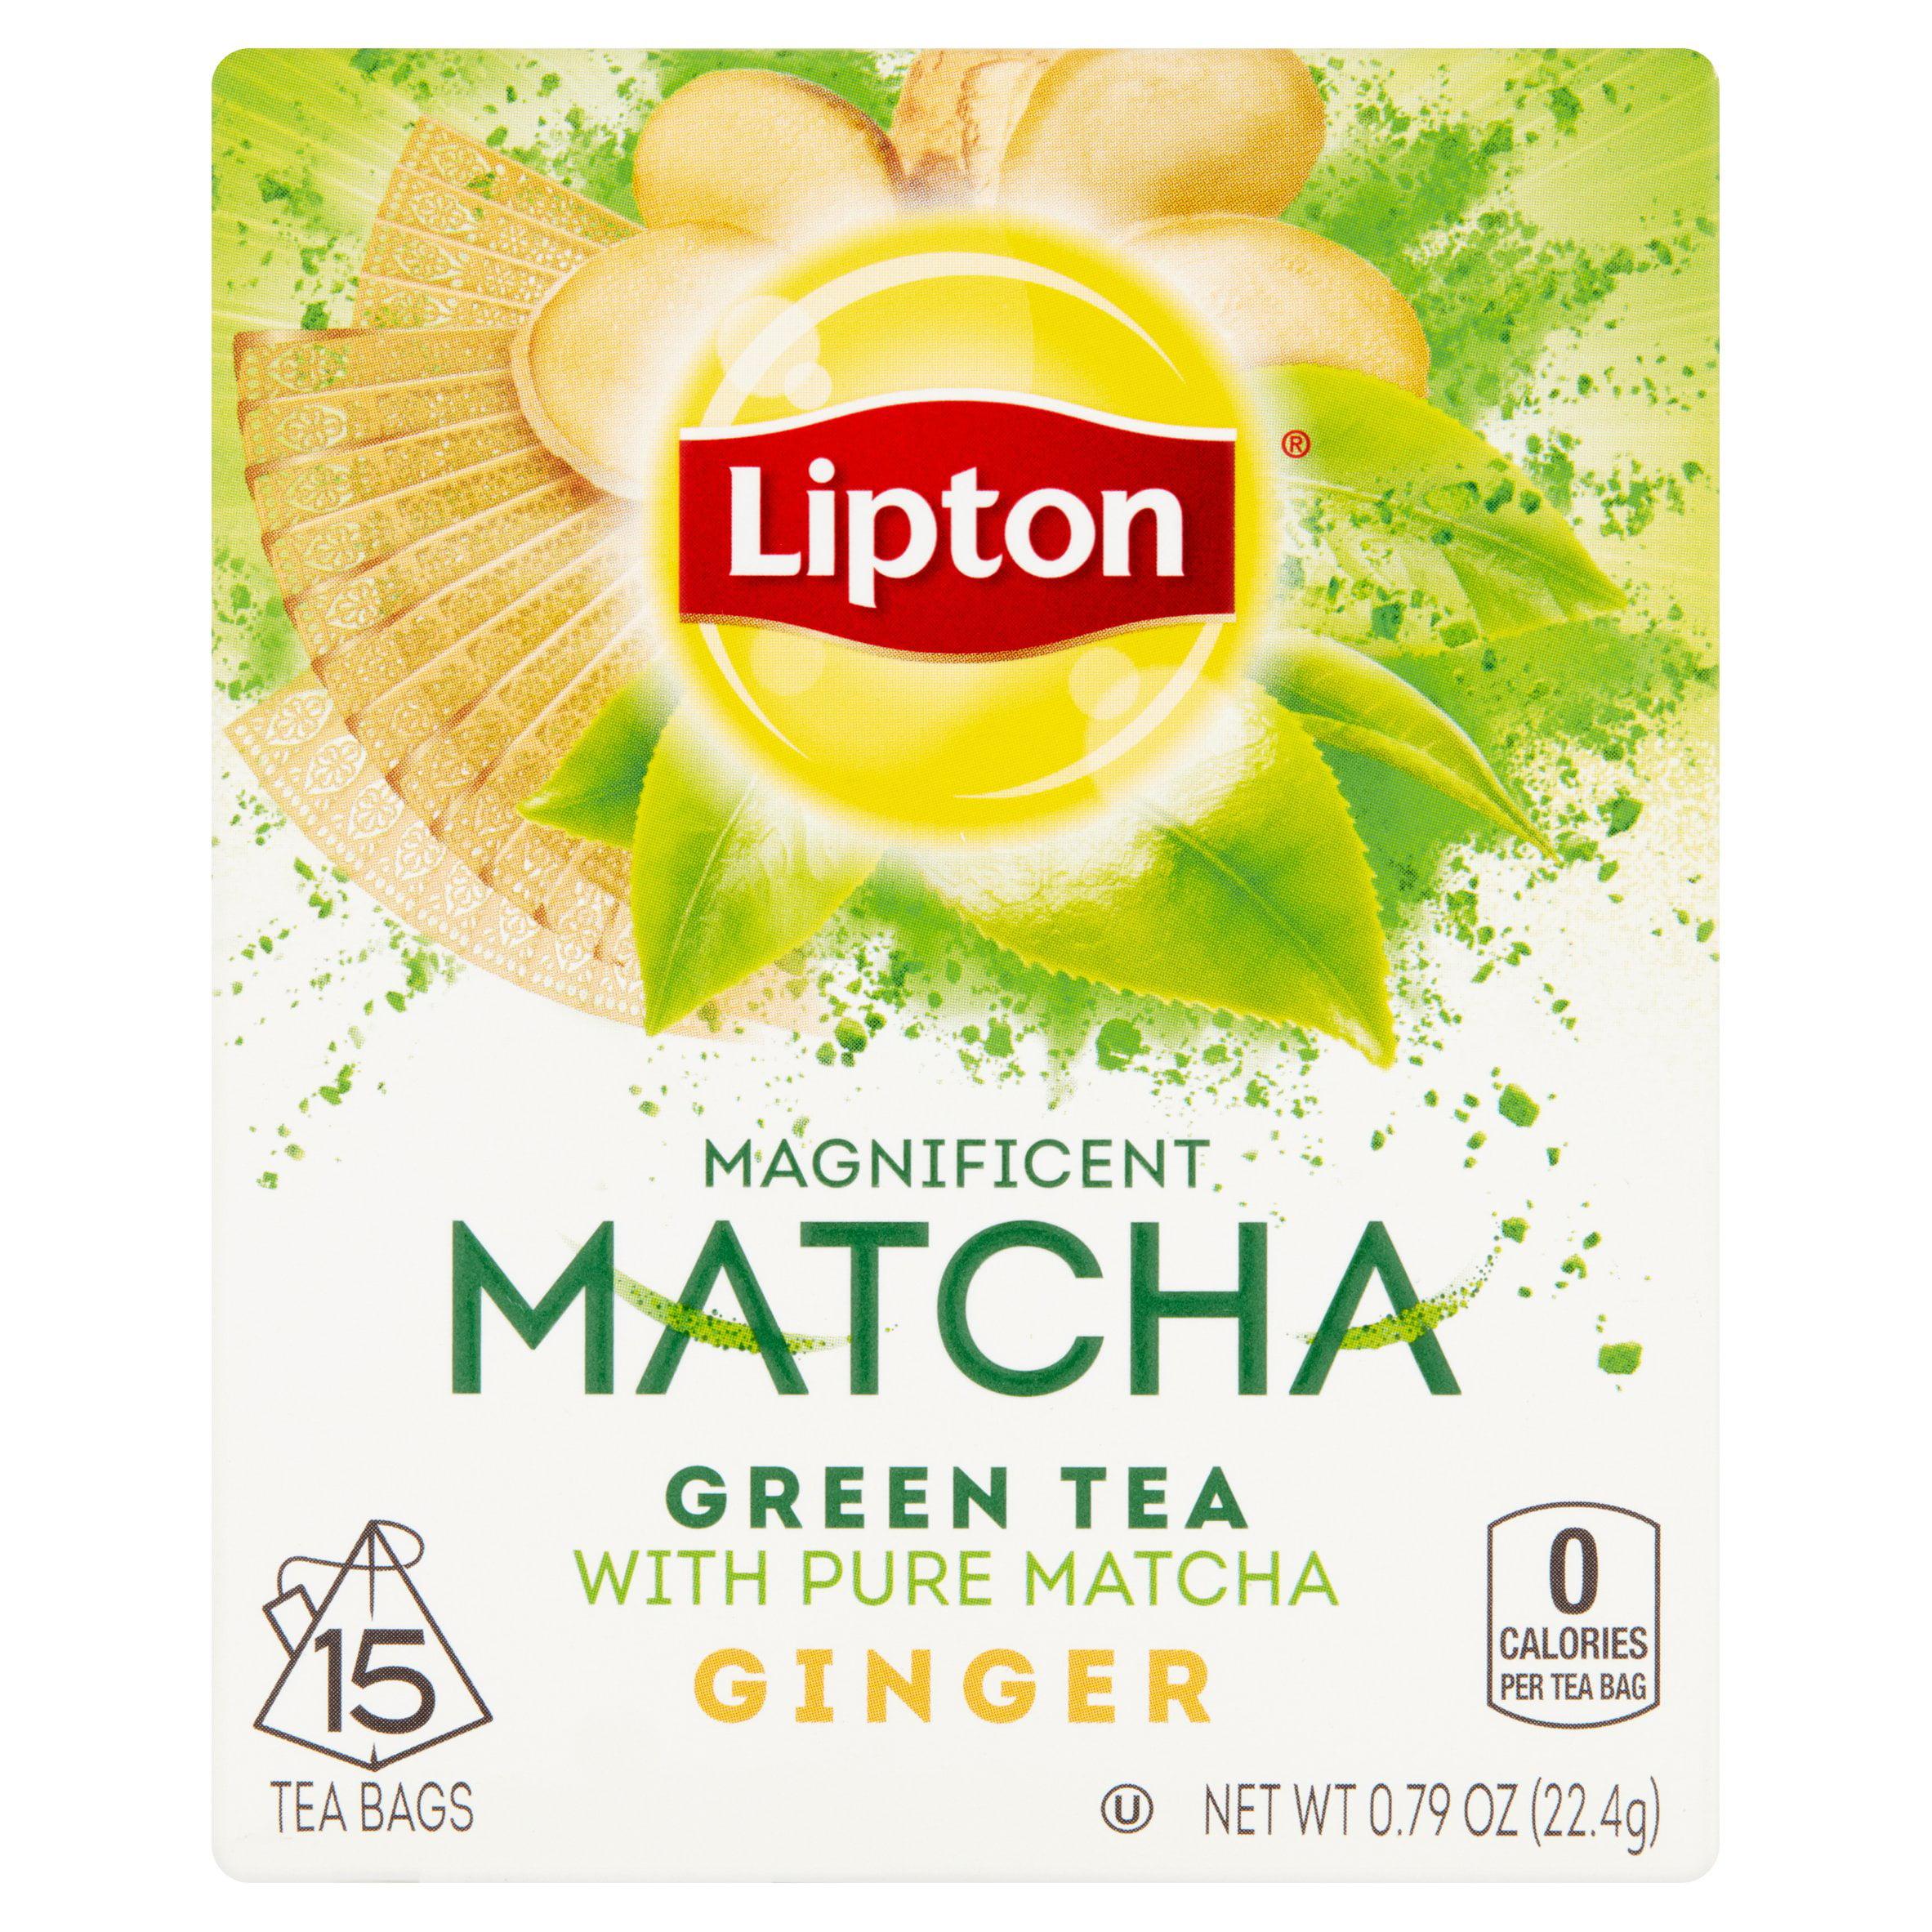 (4 Pack) Lipton Magnificent Matcha Green Tea Bags Ginger 15 ct